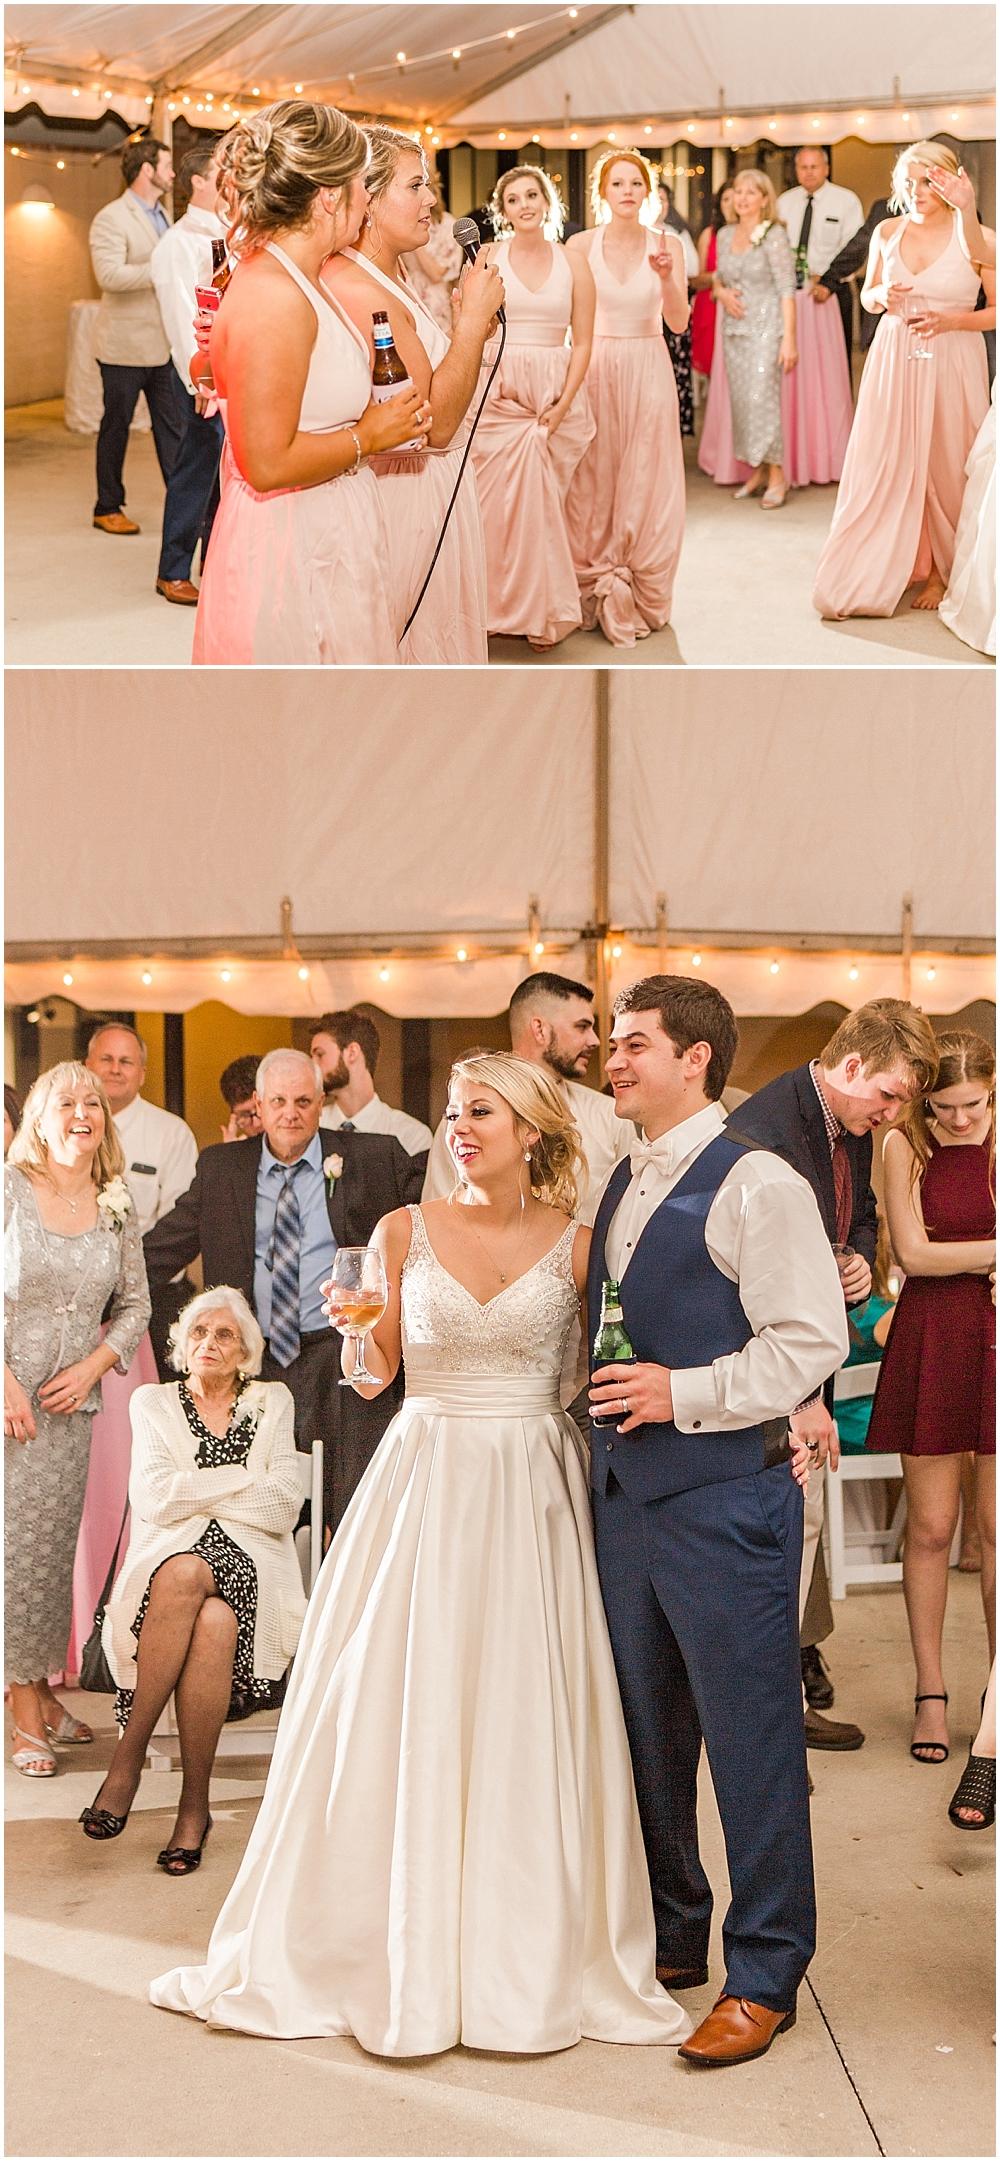 Ashton-Clark-Photography-Wedding-Portrait-Family-Photographer-Mobile-Alabama_0376.jpg